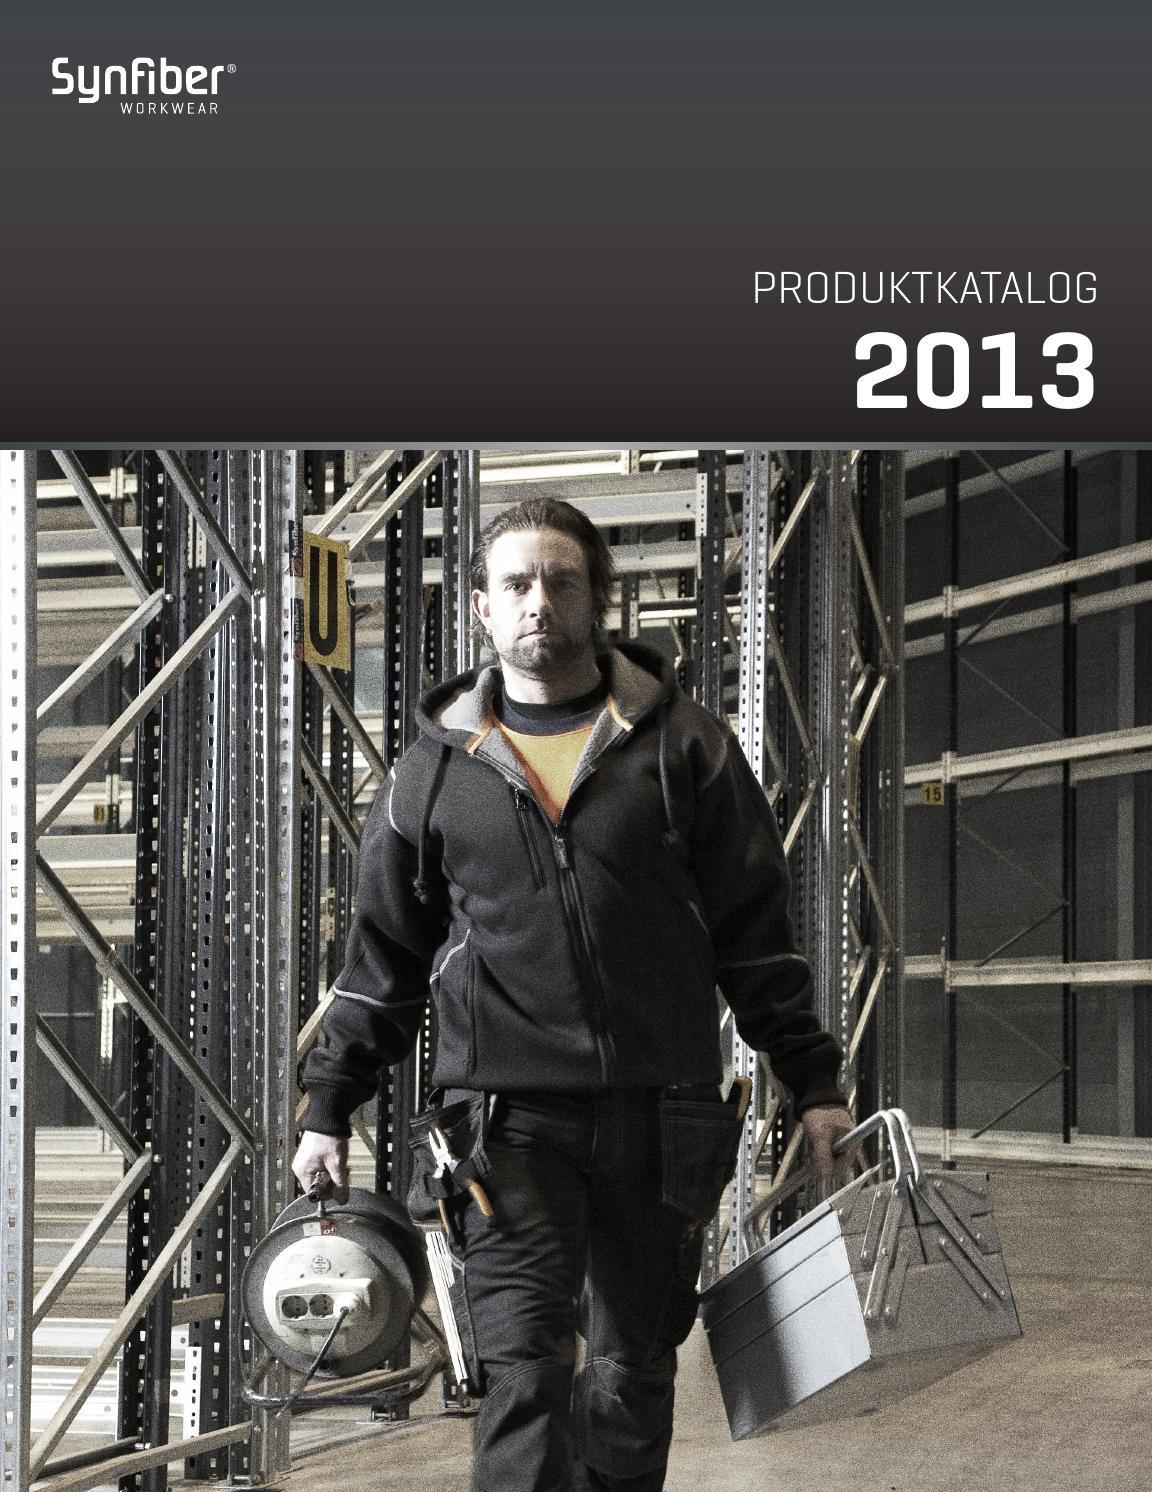 2b518be3 Synfiber katalog 2013_oppdatering by Synfiber Workwear - issuu